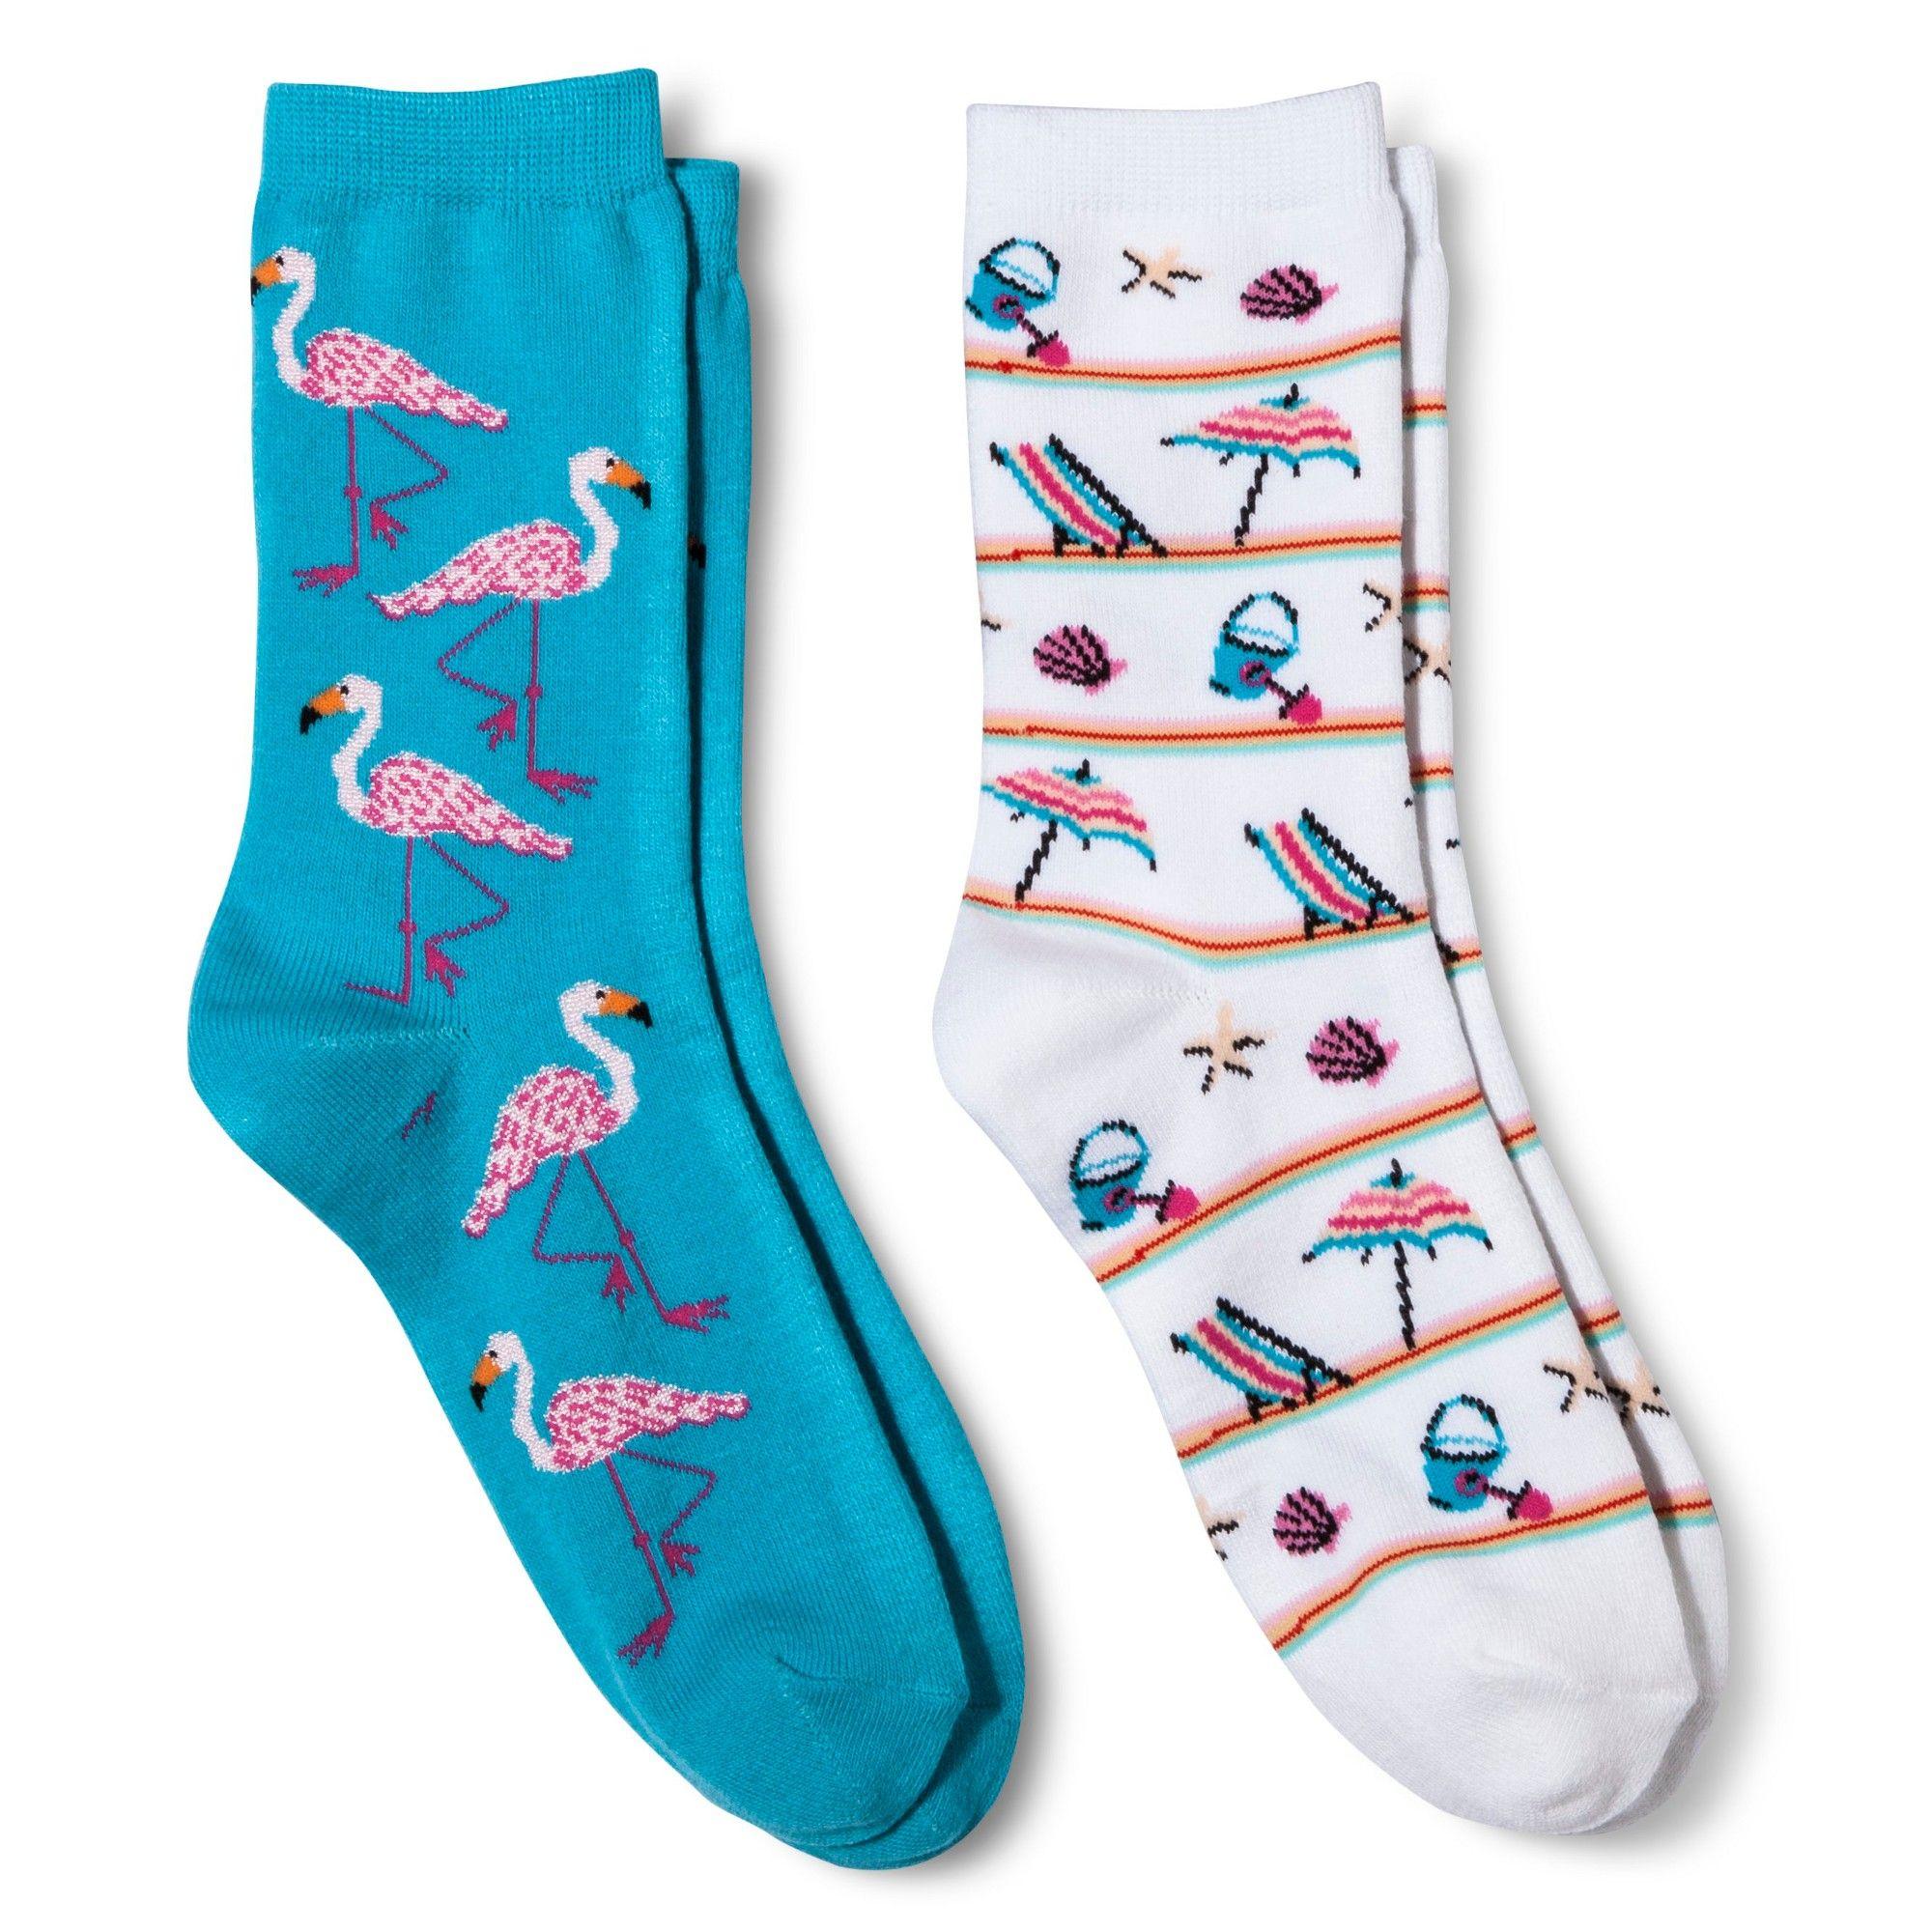 Davco Women\'s 2-Pack Fun Socks Flamingoes/Beach Stuff - Turquoise ...